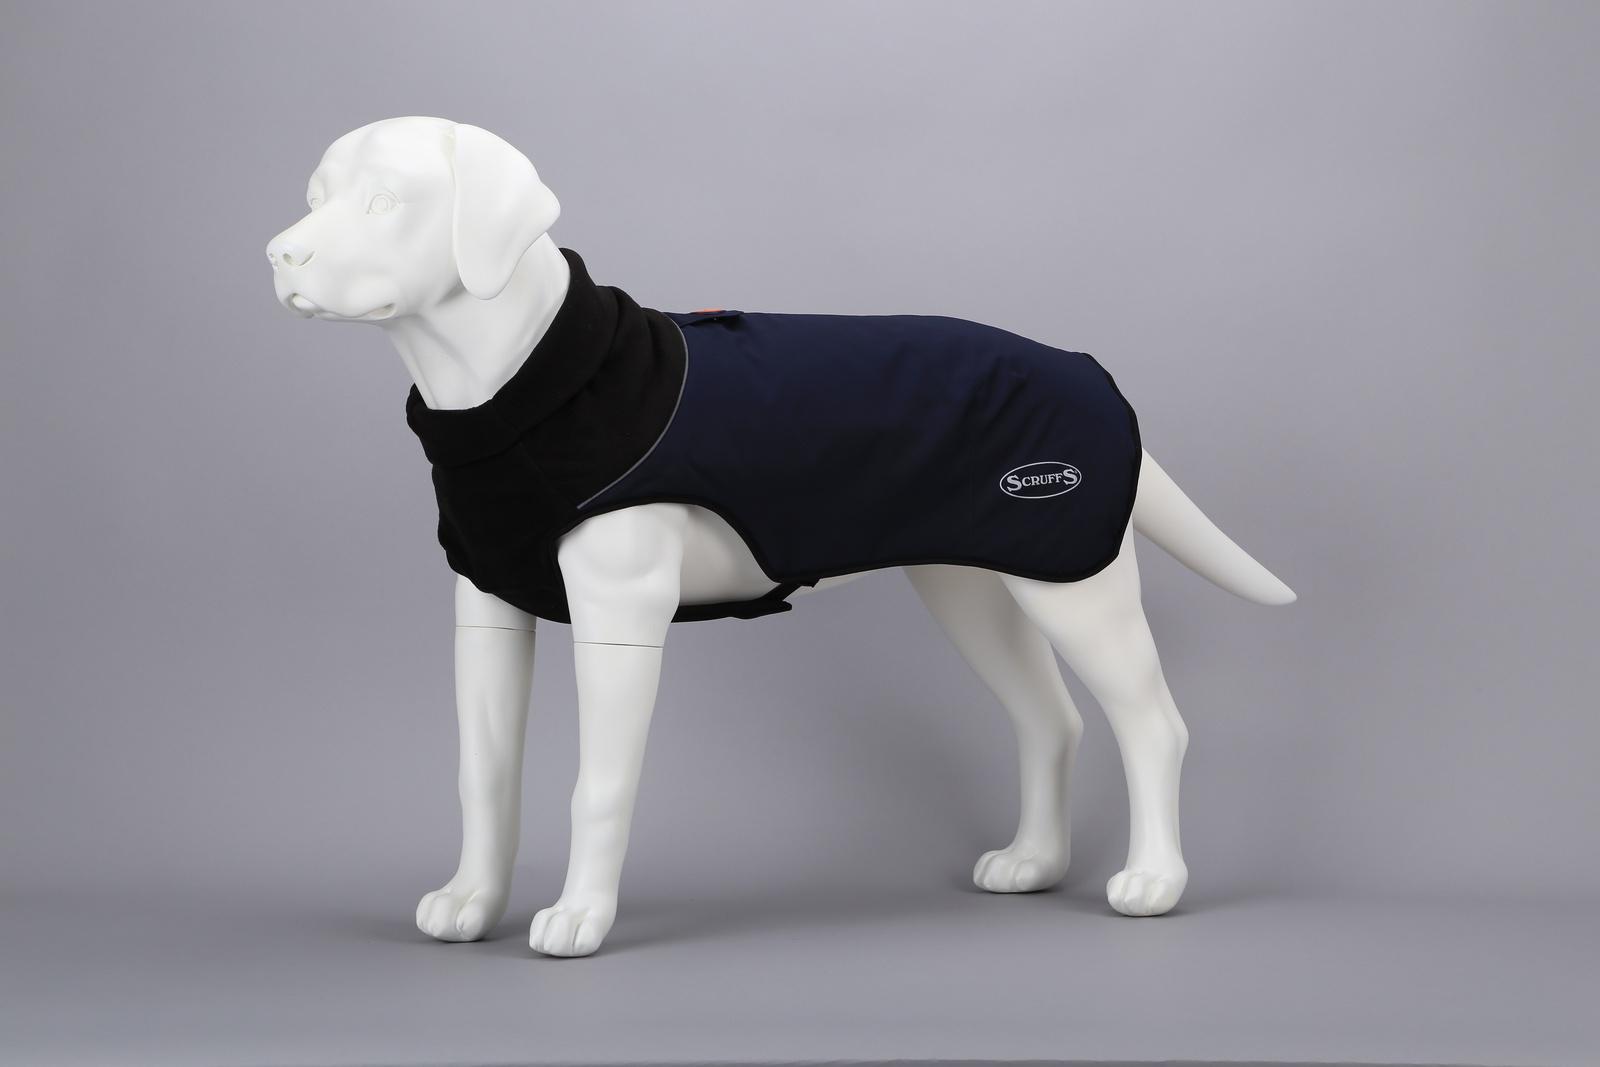 Одежда для собак SCRUFFS Thermal Попона согревающая 936082, 36см, темно-синий